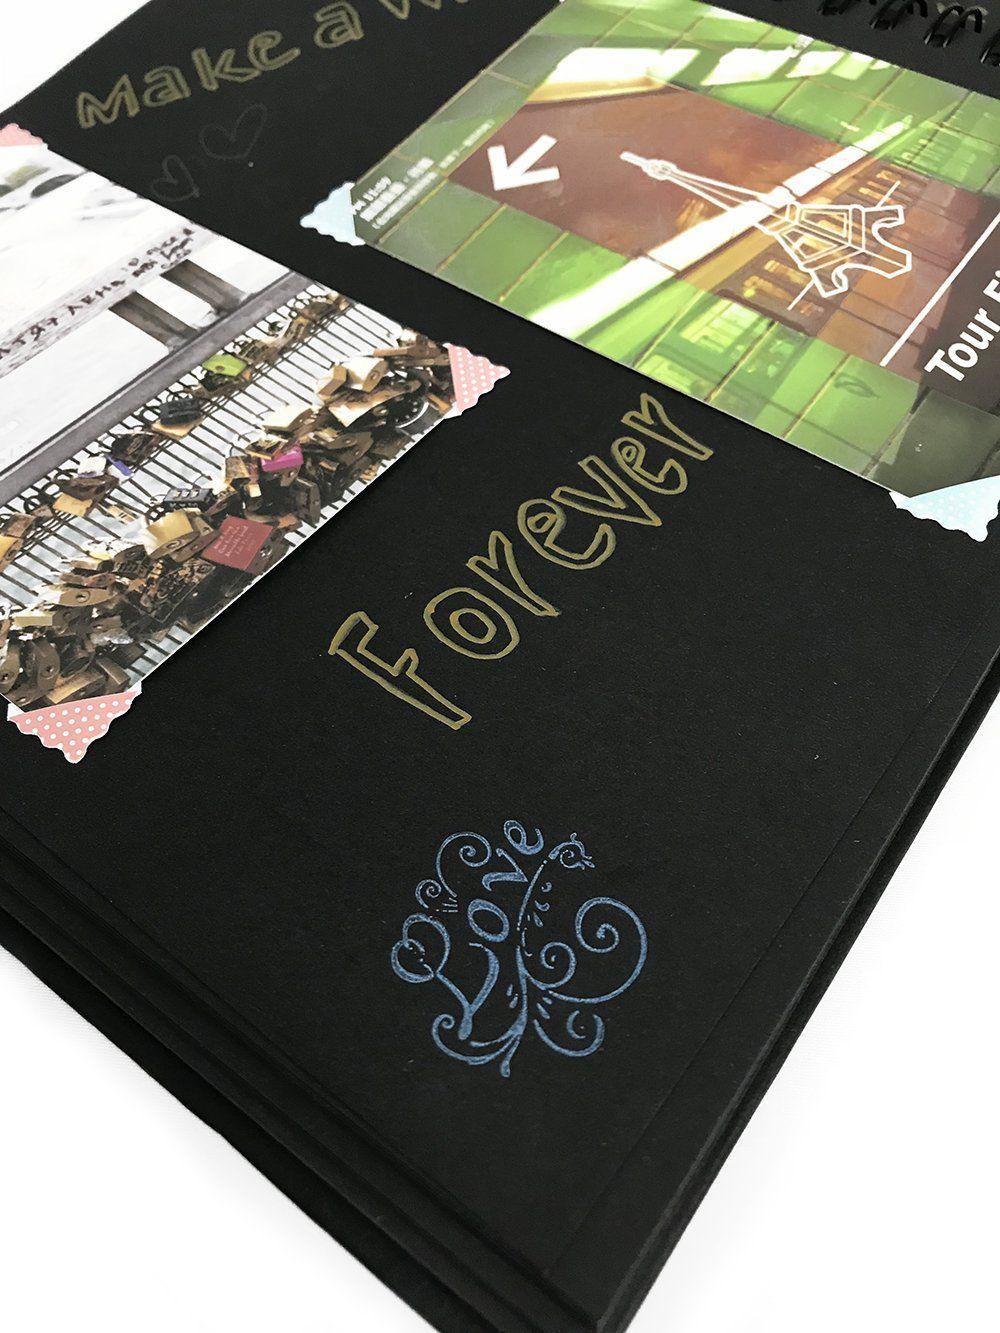 Scrapbook photo album x inchblack guest book wedding guest book